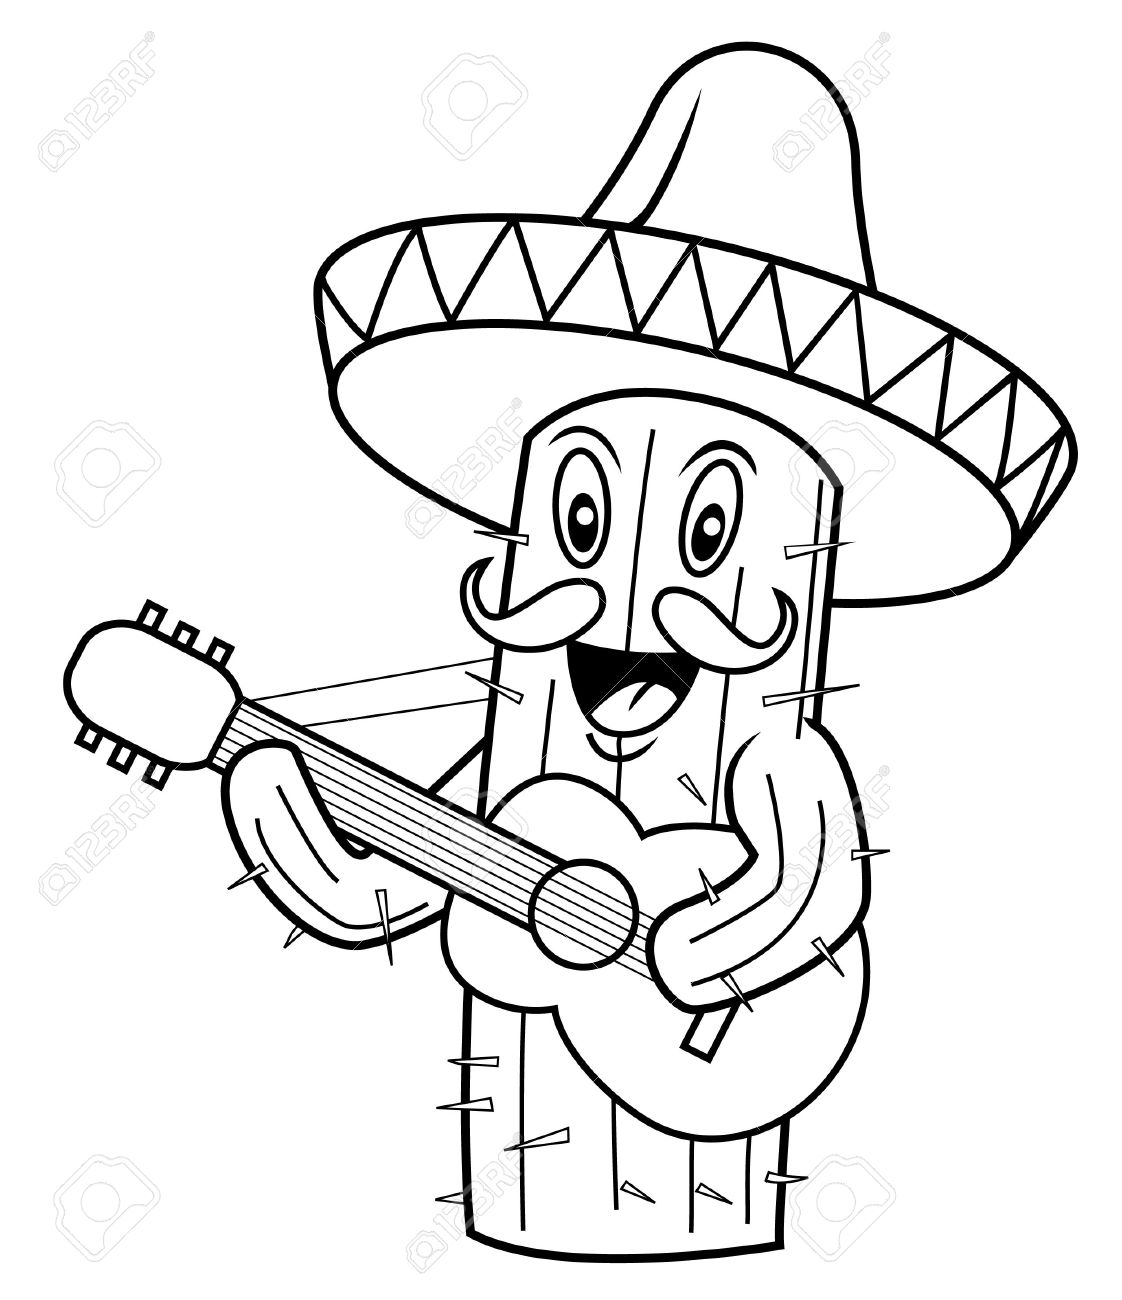 Excelente Hoja Para Colorear De Cactus Inspiración - Dibujos Para ...